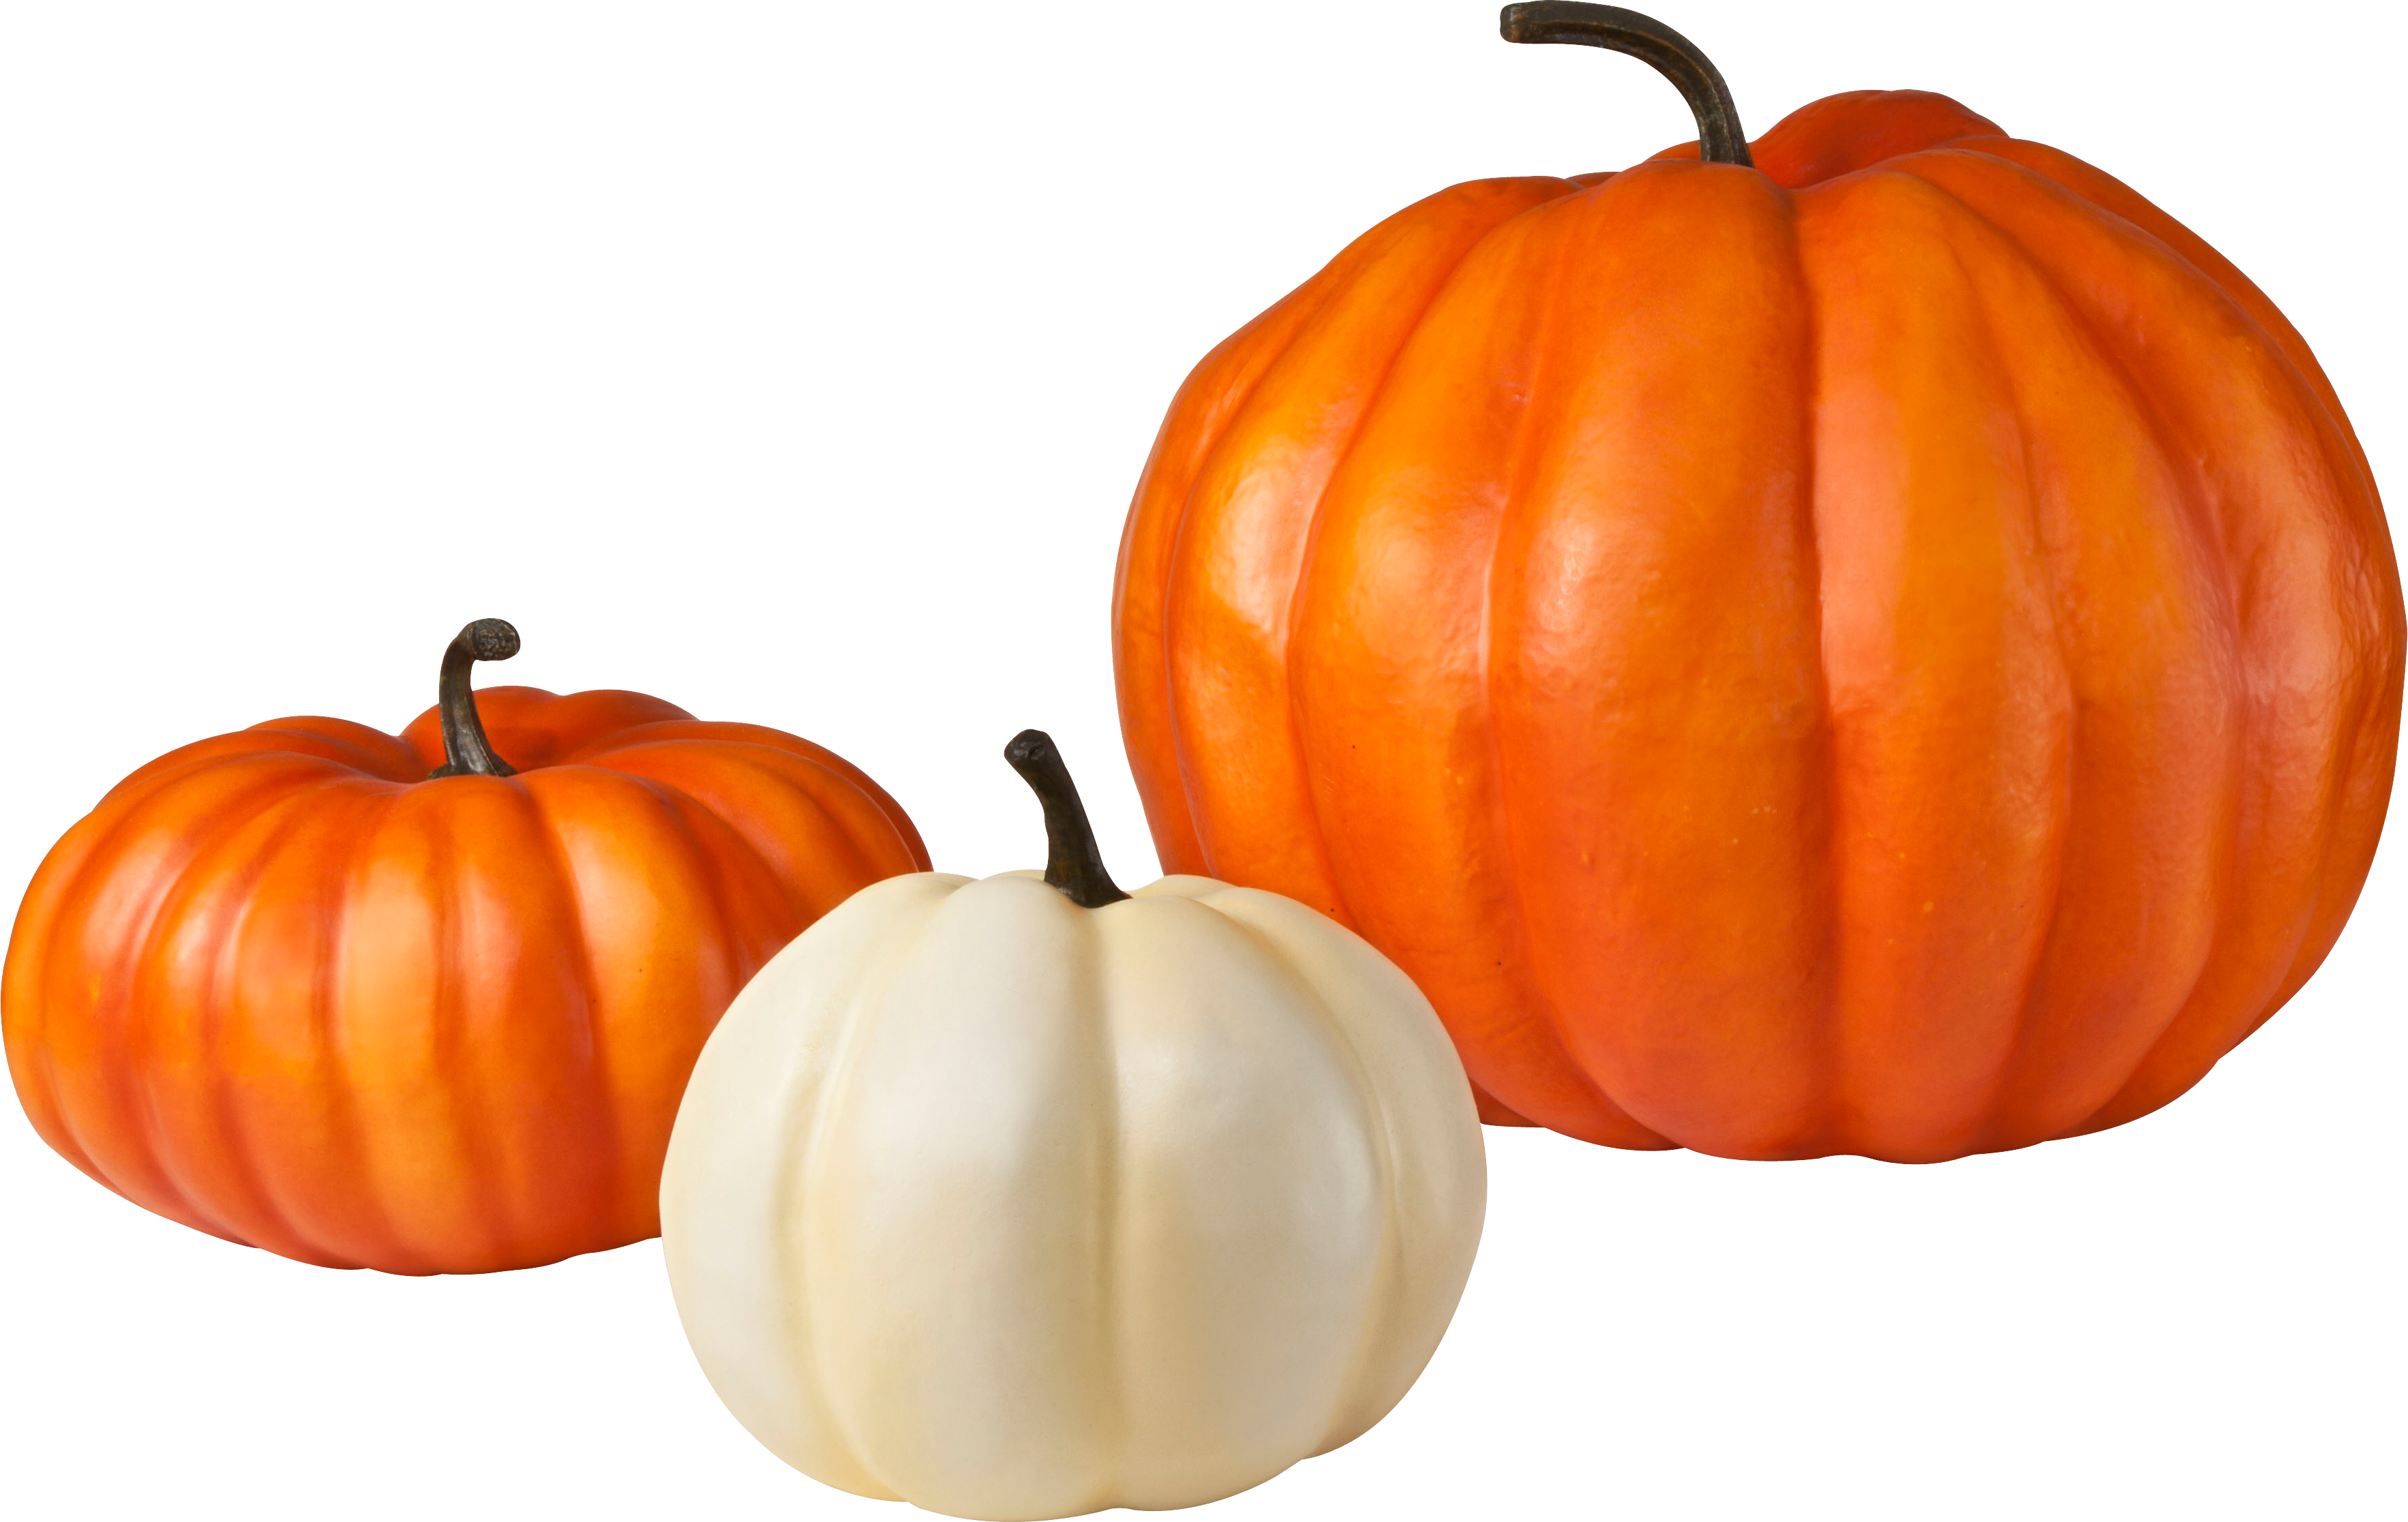 Pumpkin PNG image - Pumpkin PNG